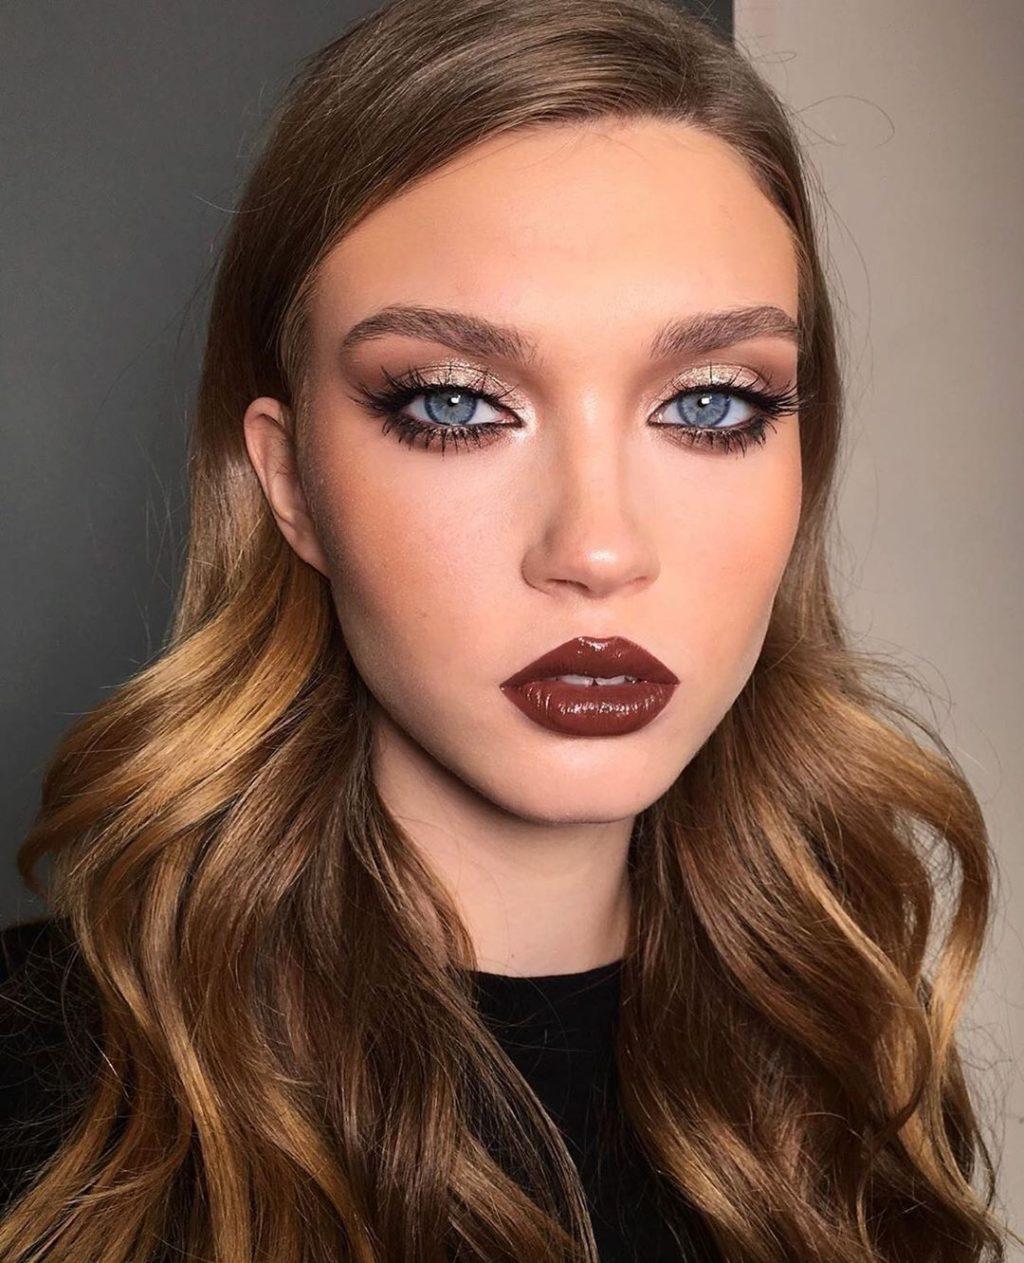 Golden-Smokey-Eye-make-up-3-1024x1263 60+ Hottest Smokey Eye Makeup Looks in 2021